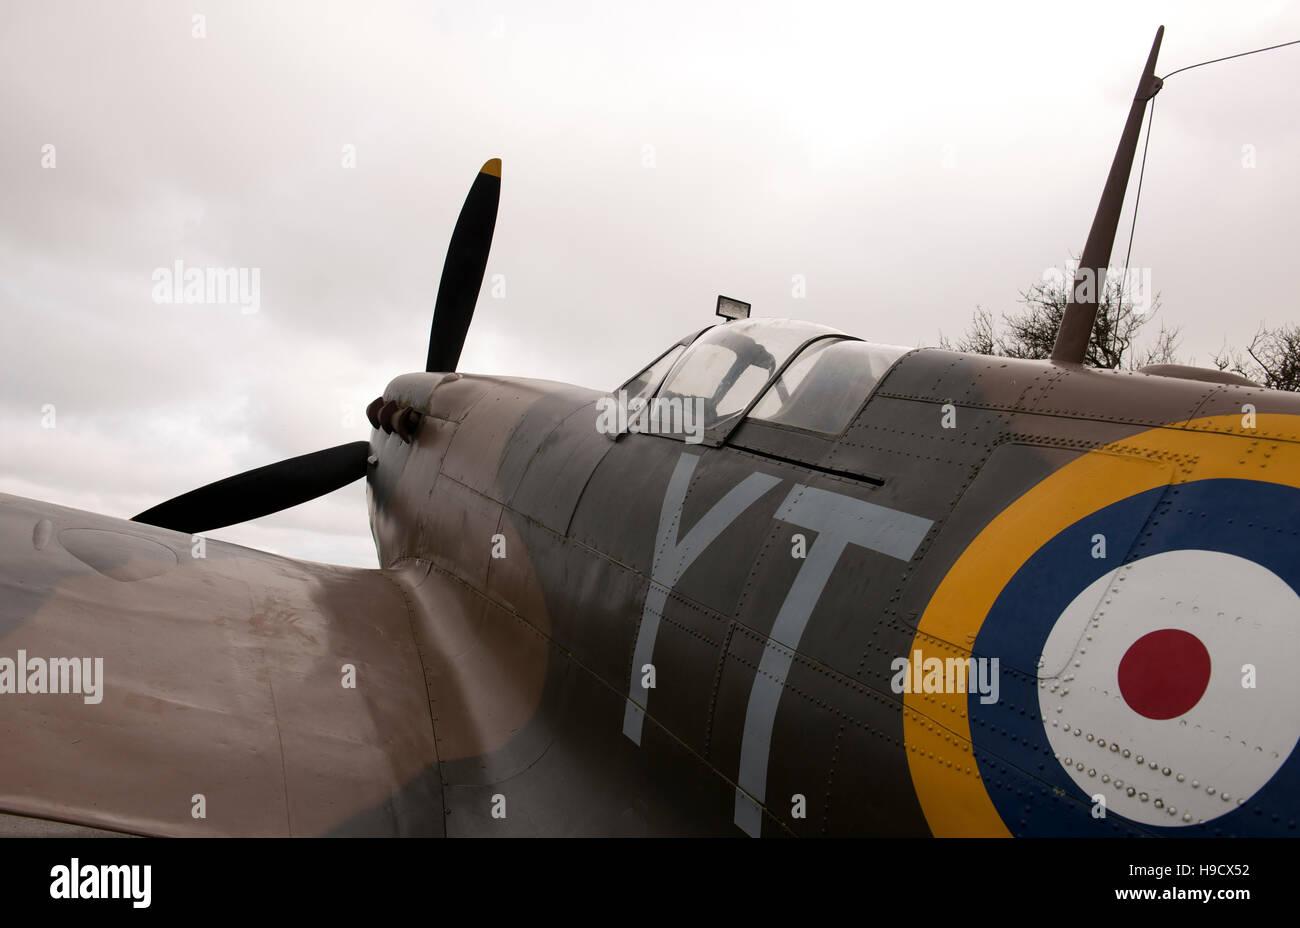 Replica Spitfire aircraft at Battle of Britain Memorial, Capel-le-Ferne, Folkestone, Kent. - Stock Image